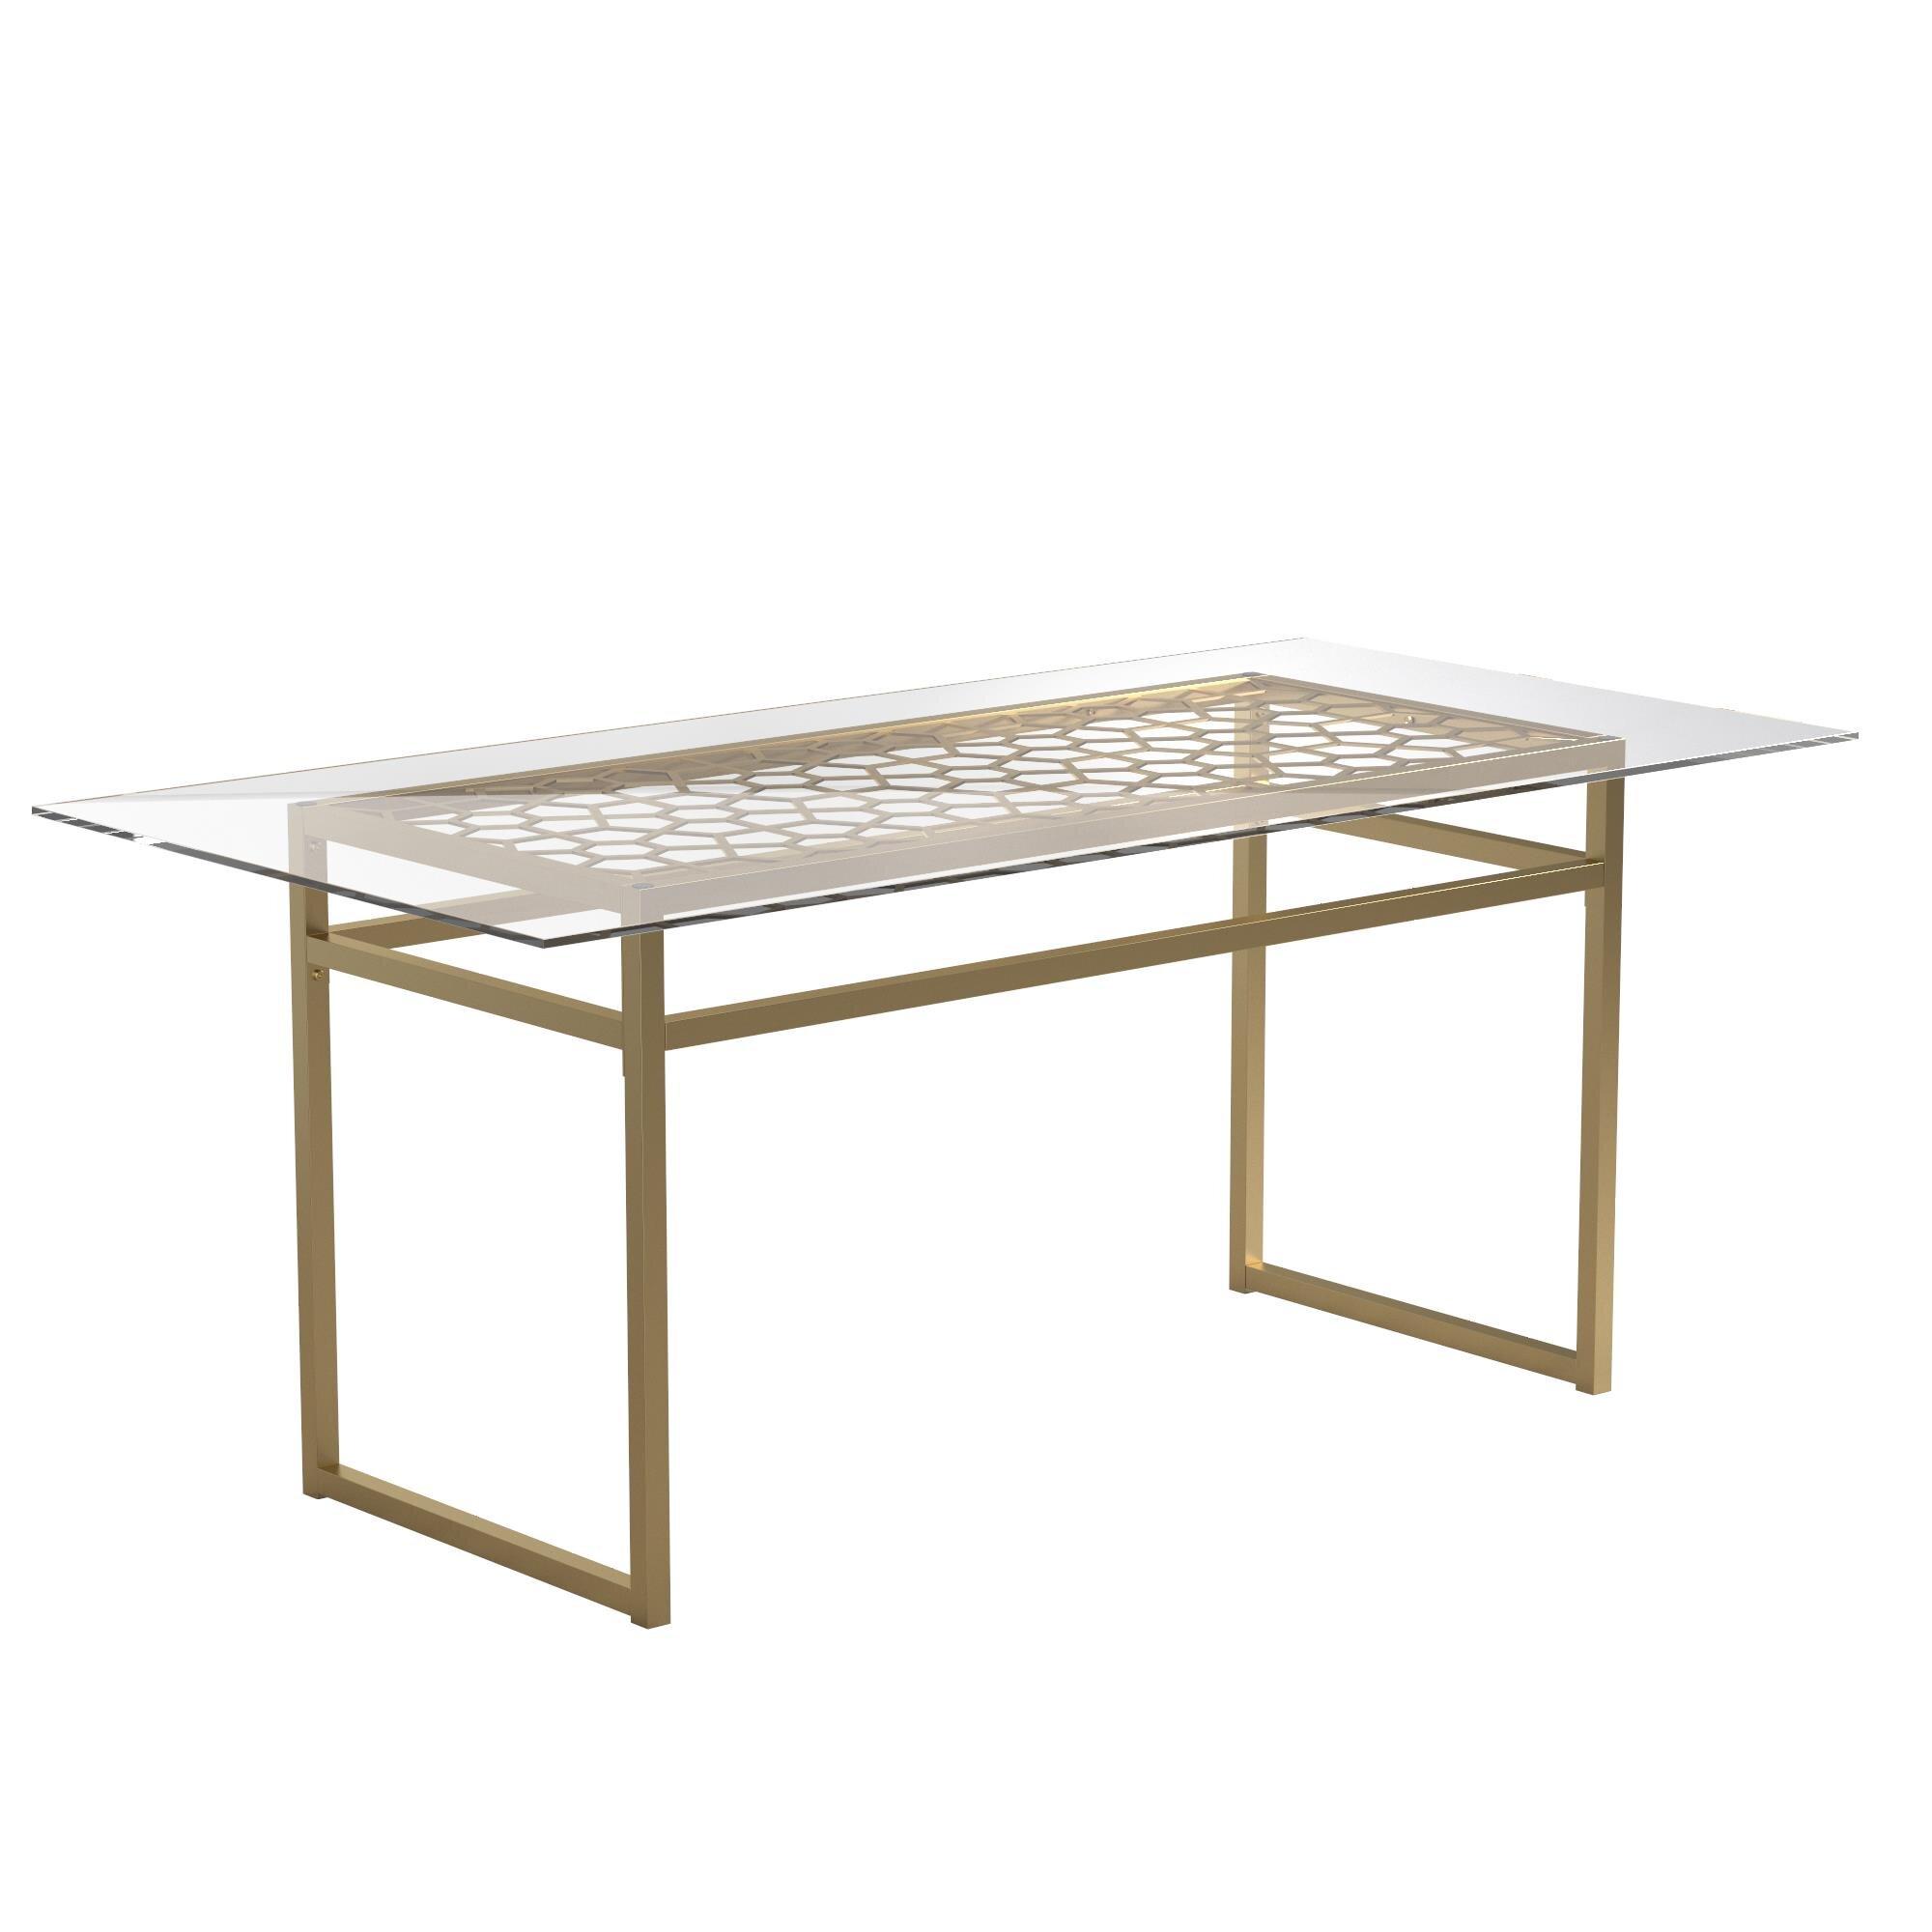 Cosmoliving By Cosmopolitan Juliette 36 Glass Top Dining Table Wayfair